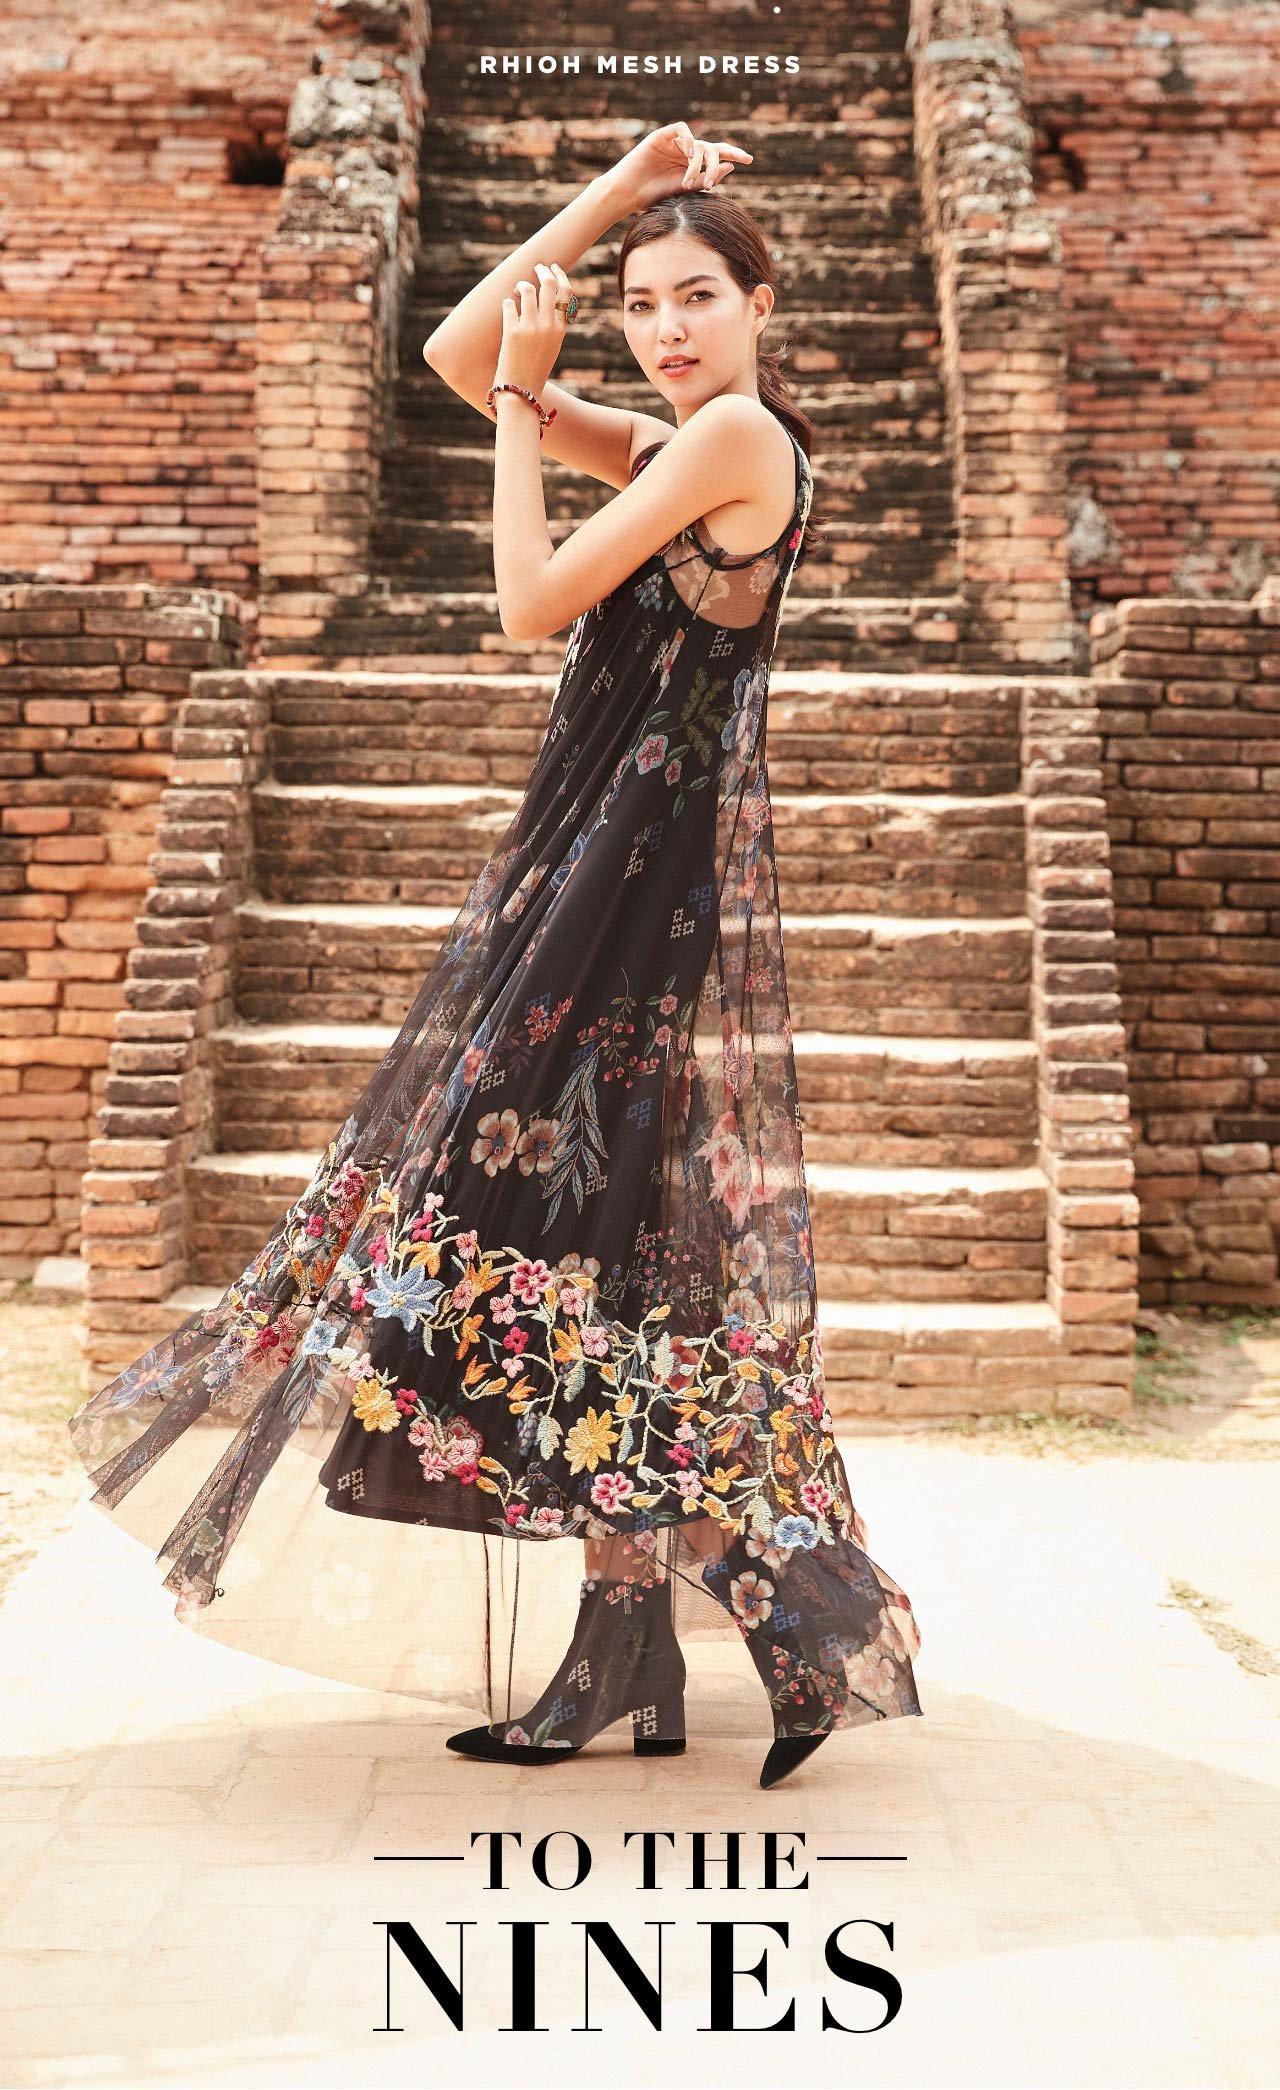 To The Nines - Rhioh Mesh Dress